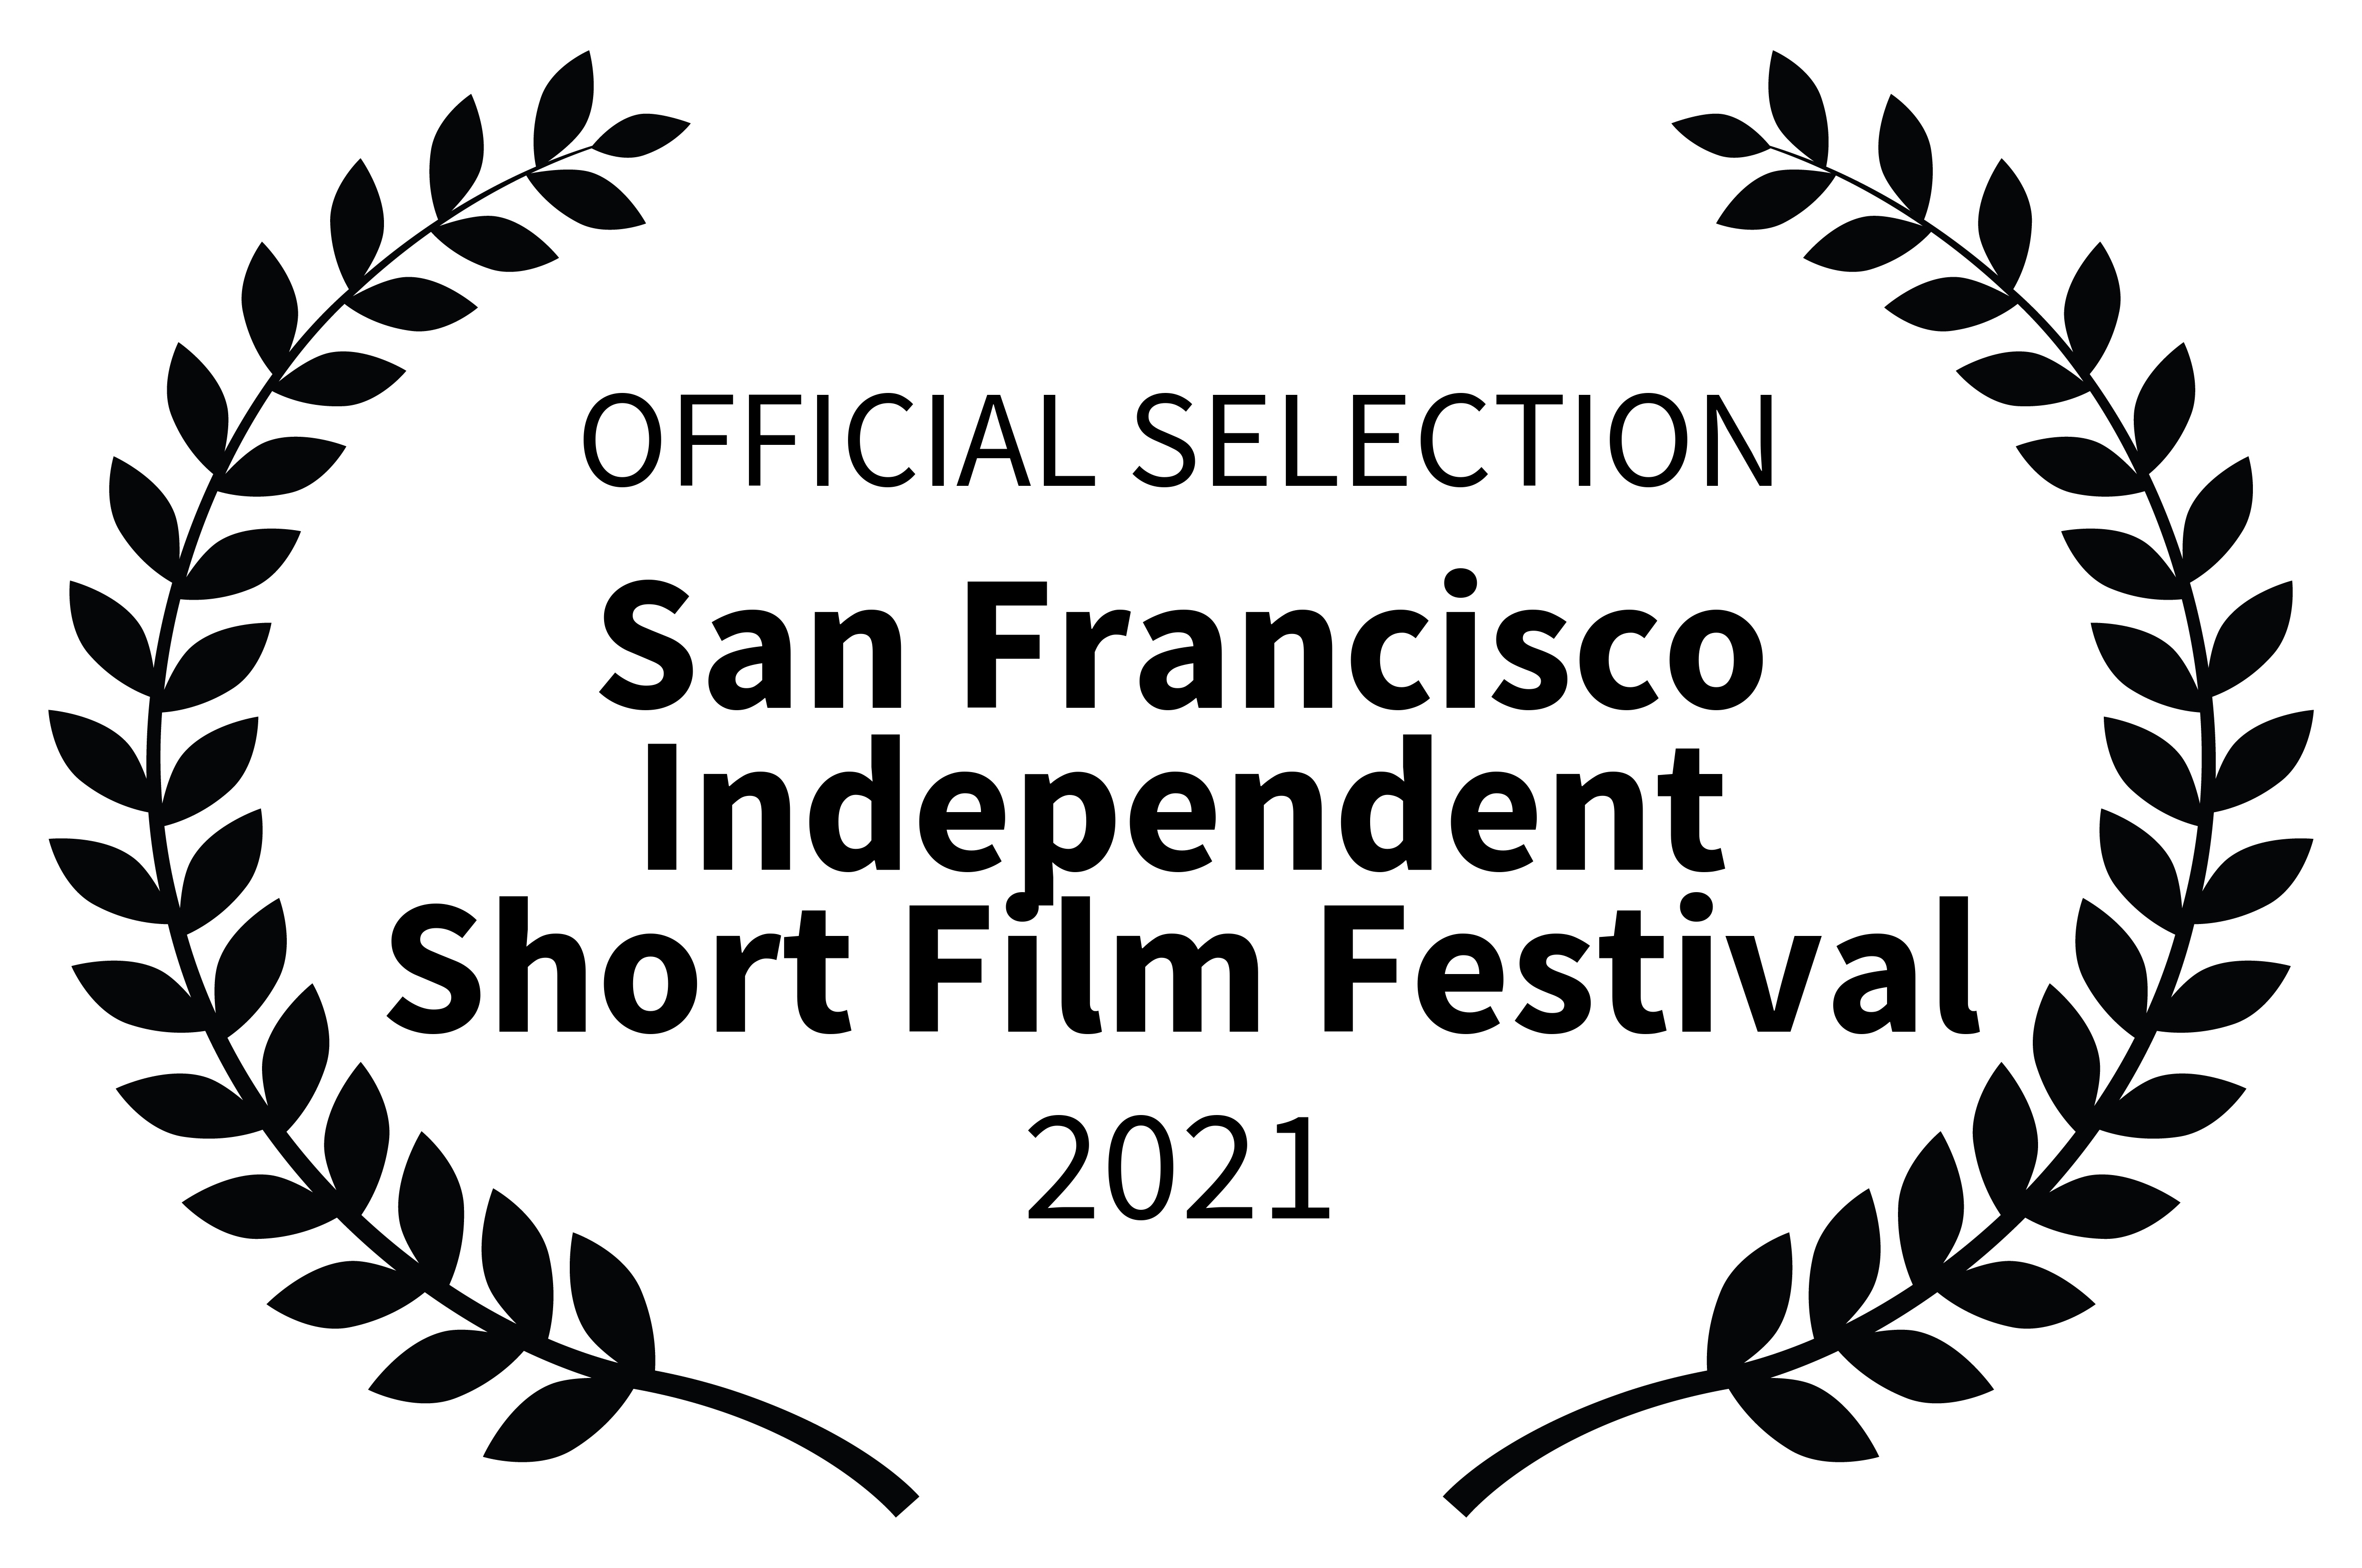 Official Selection, San Francisco Short Film Festival